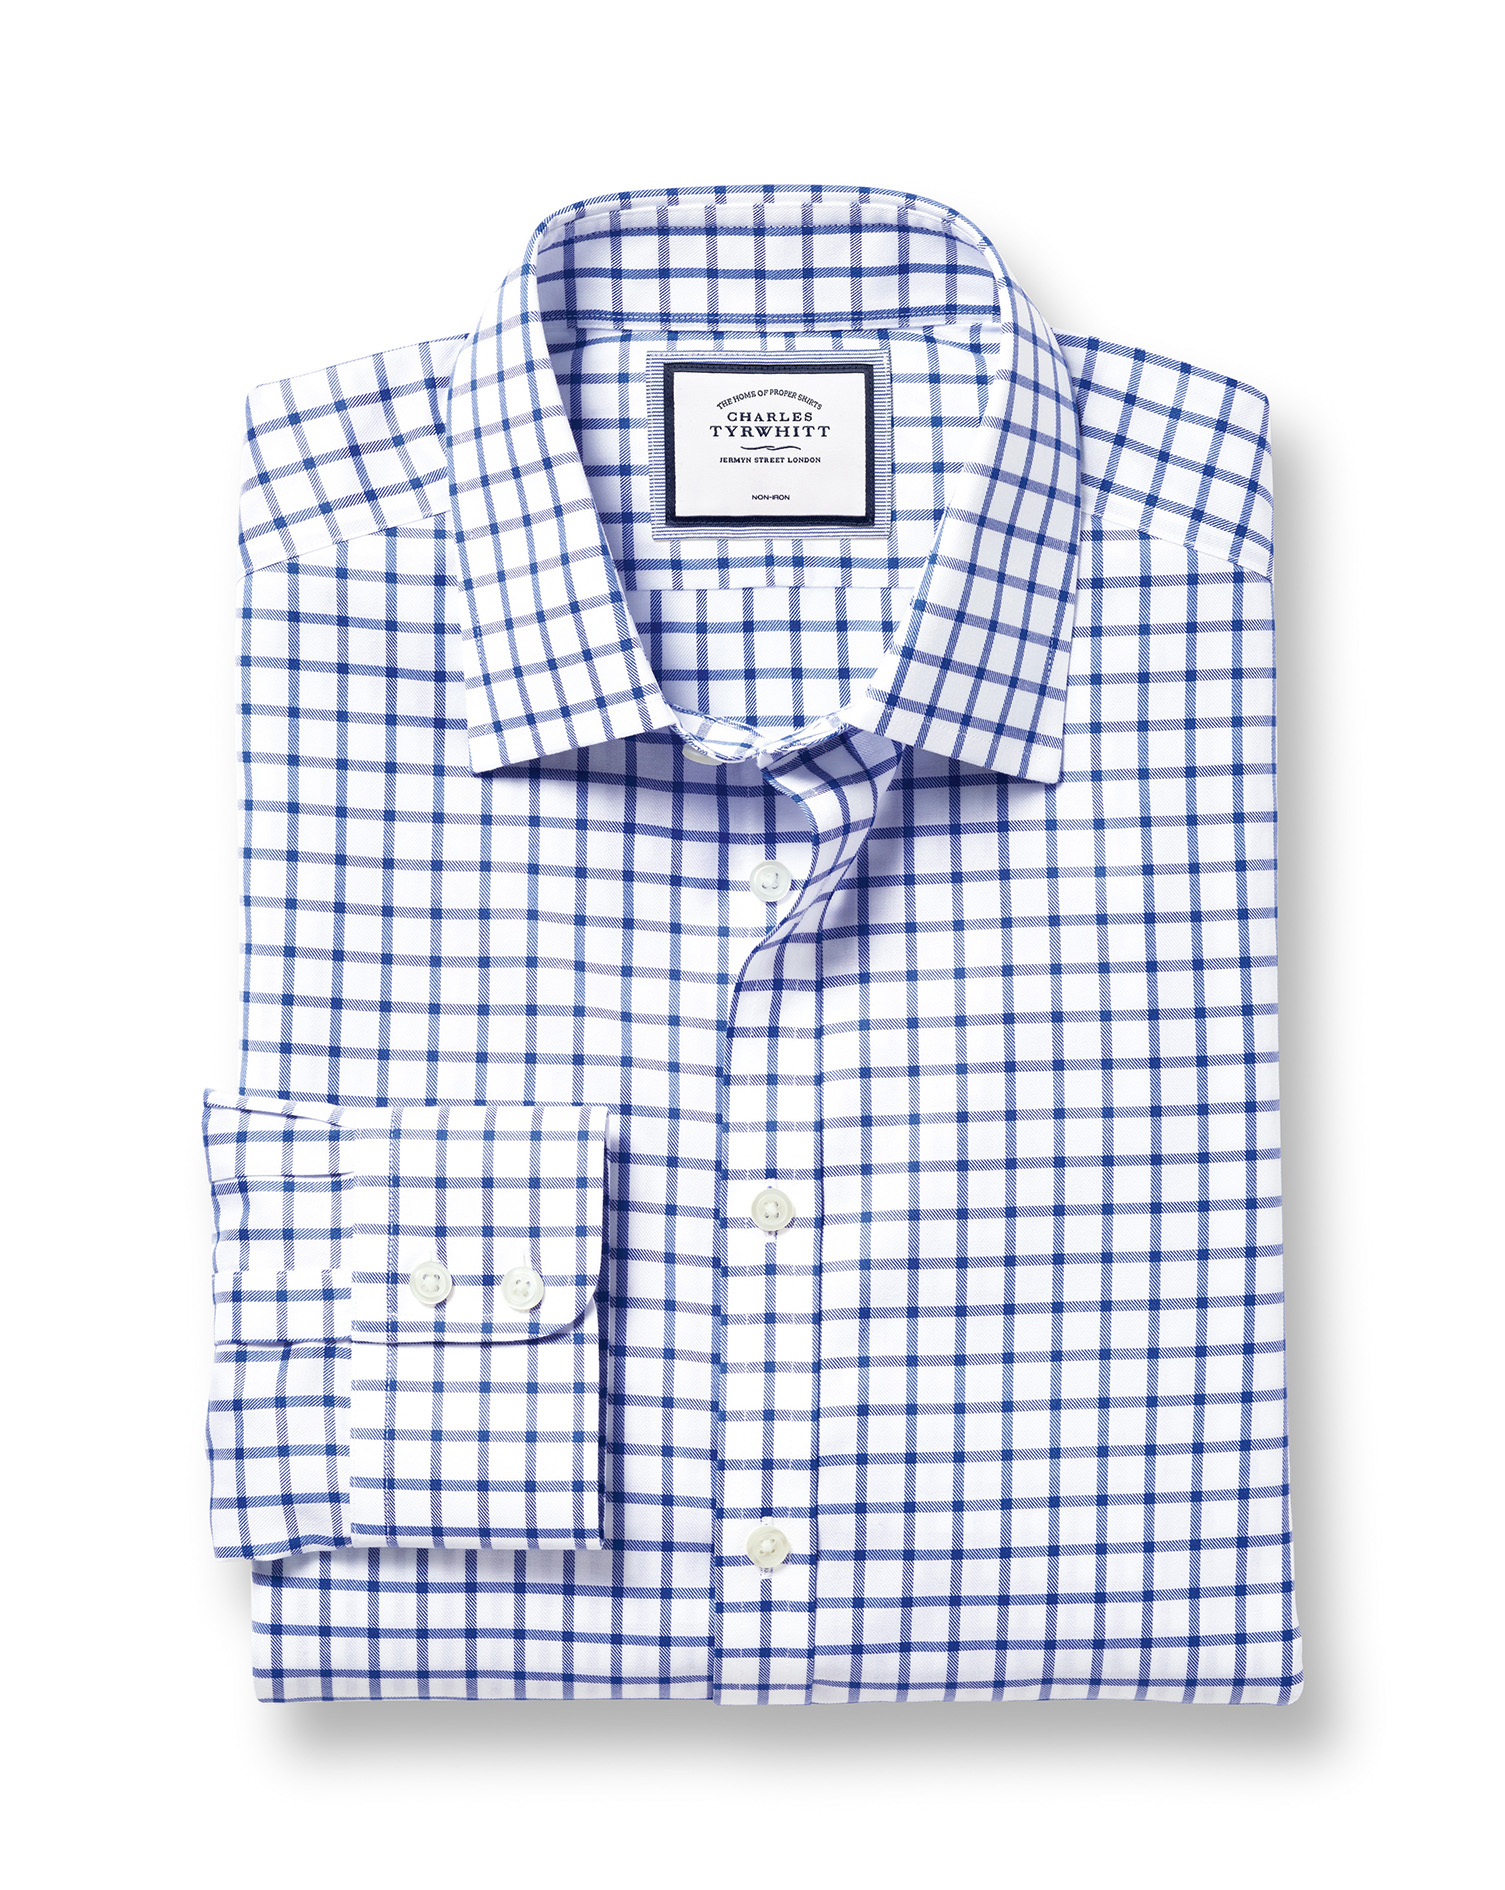 Cotton Classic Collar Non-Iron Twill Grid Check Shirt - Royal Blue